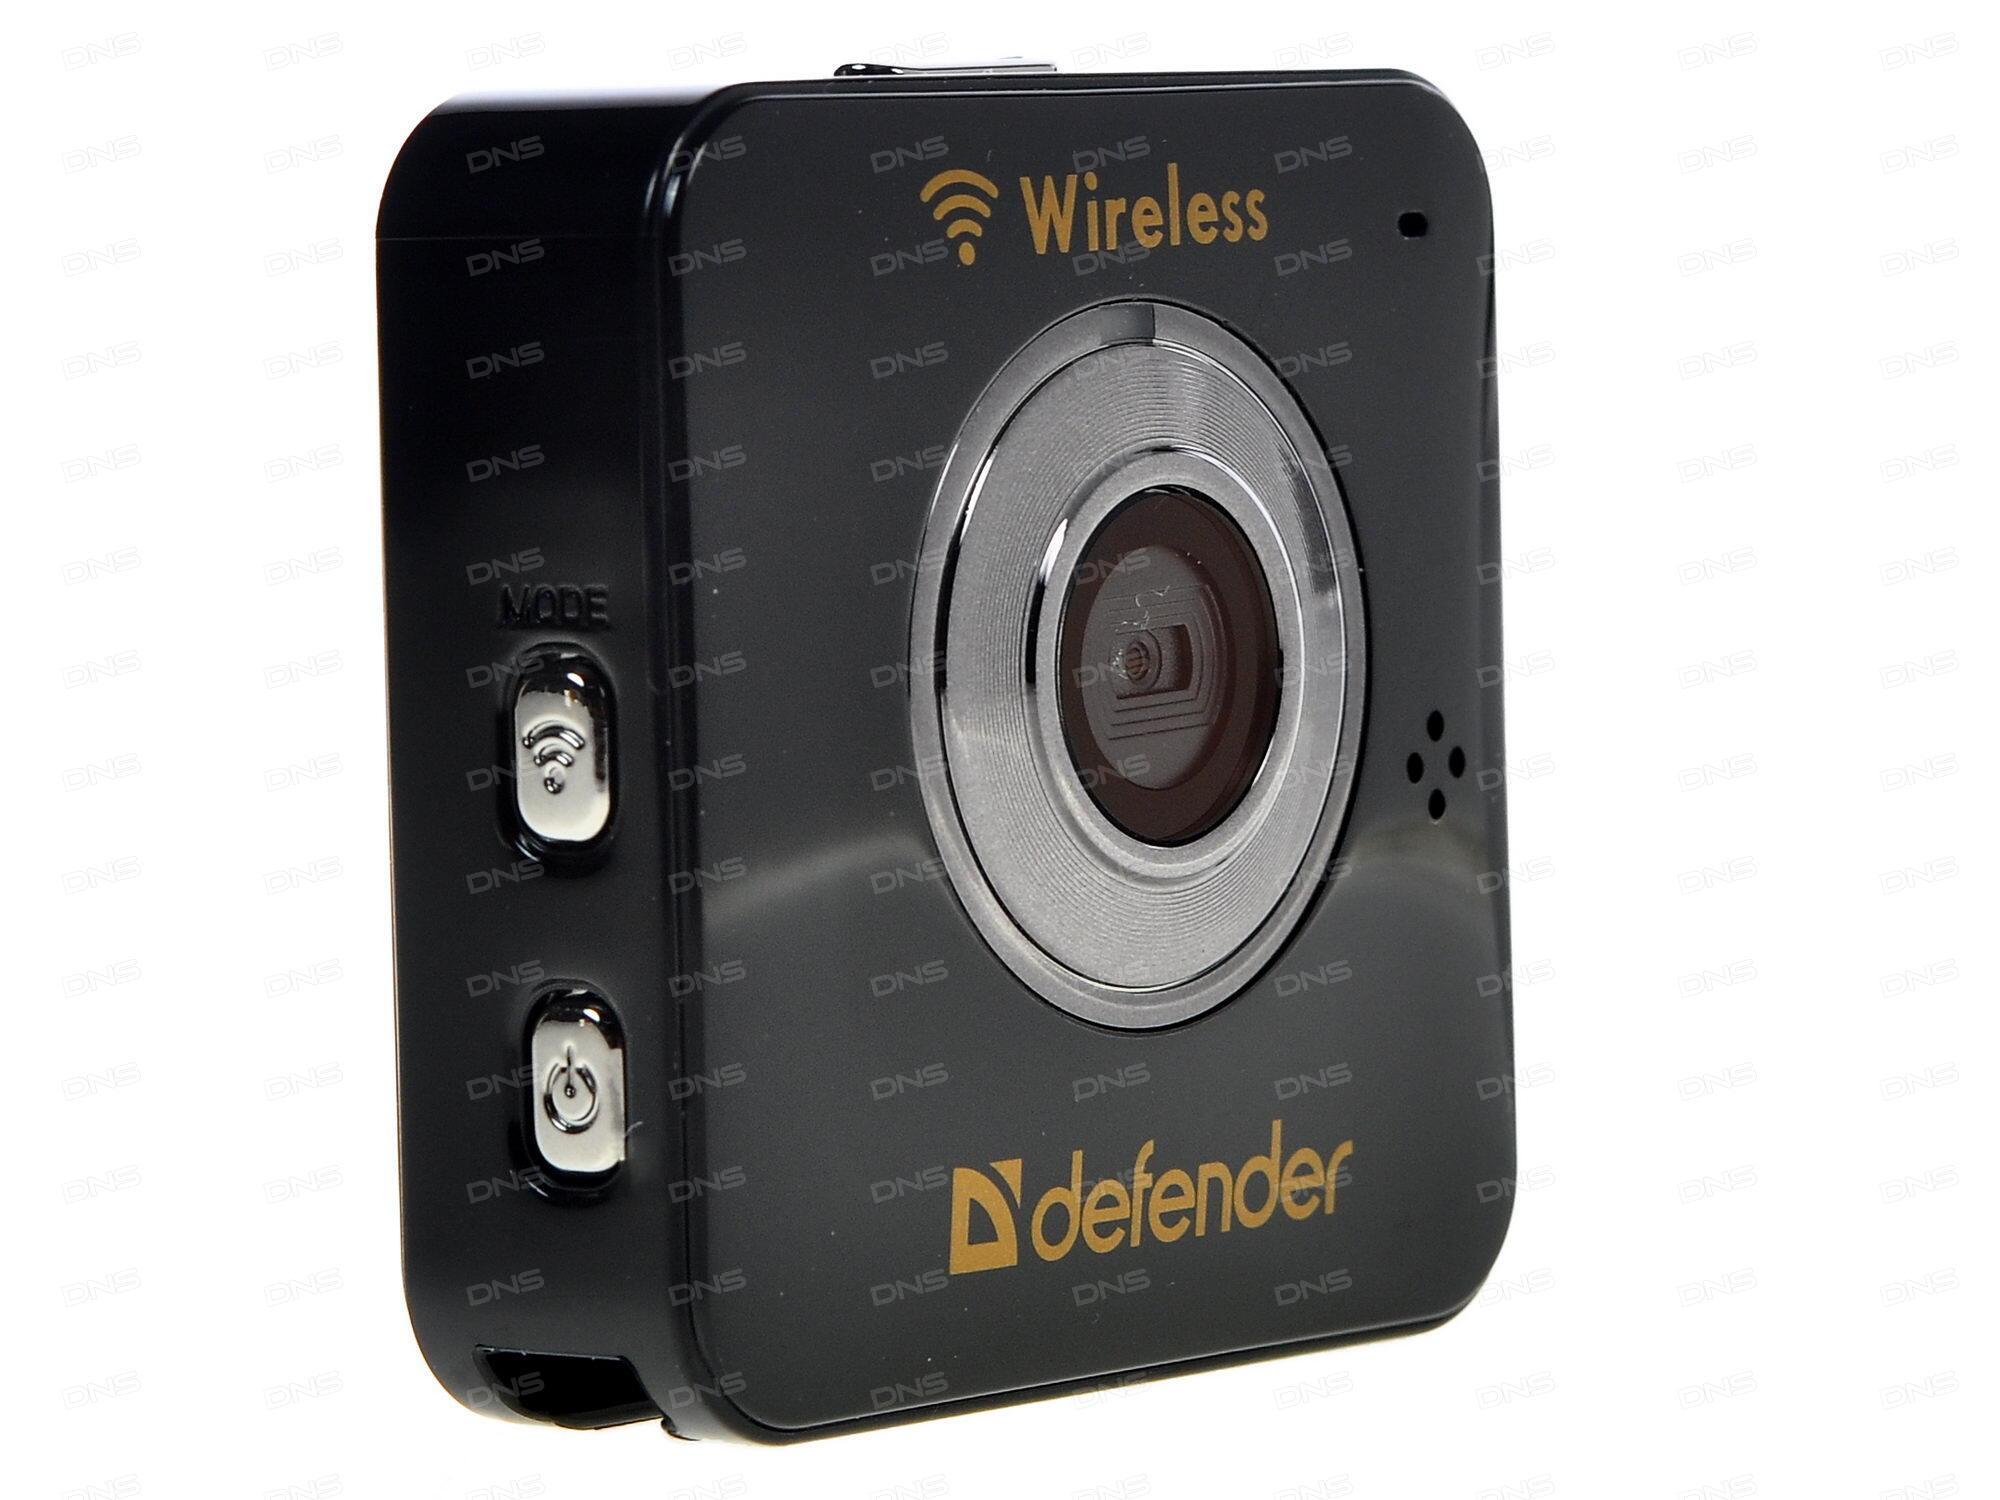 веб камера в i знакомство